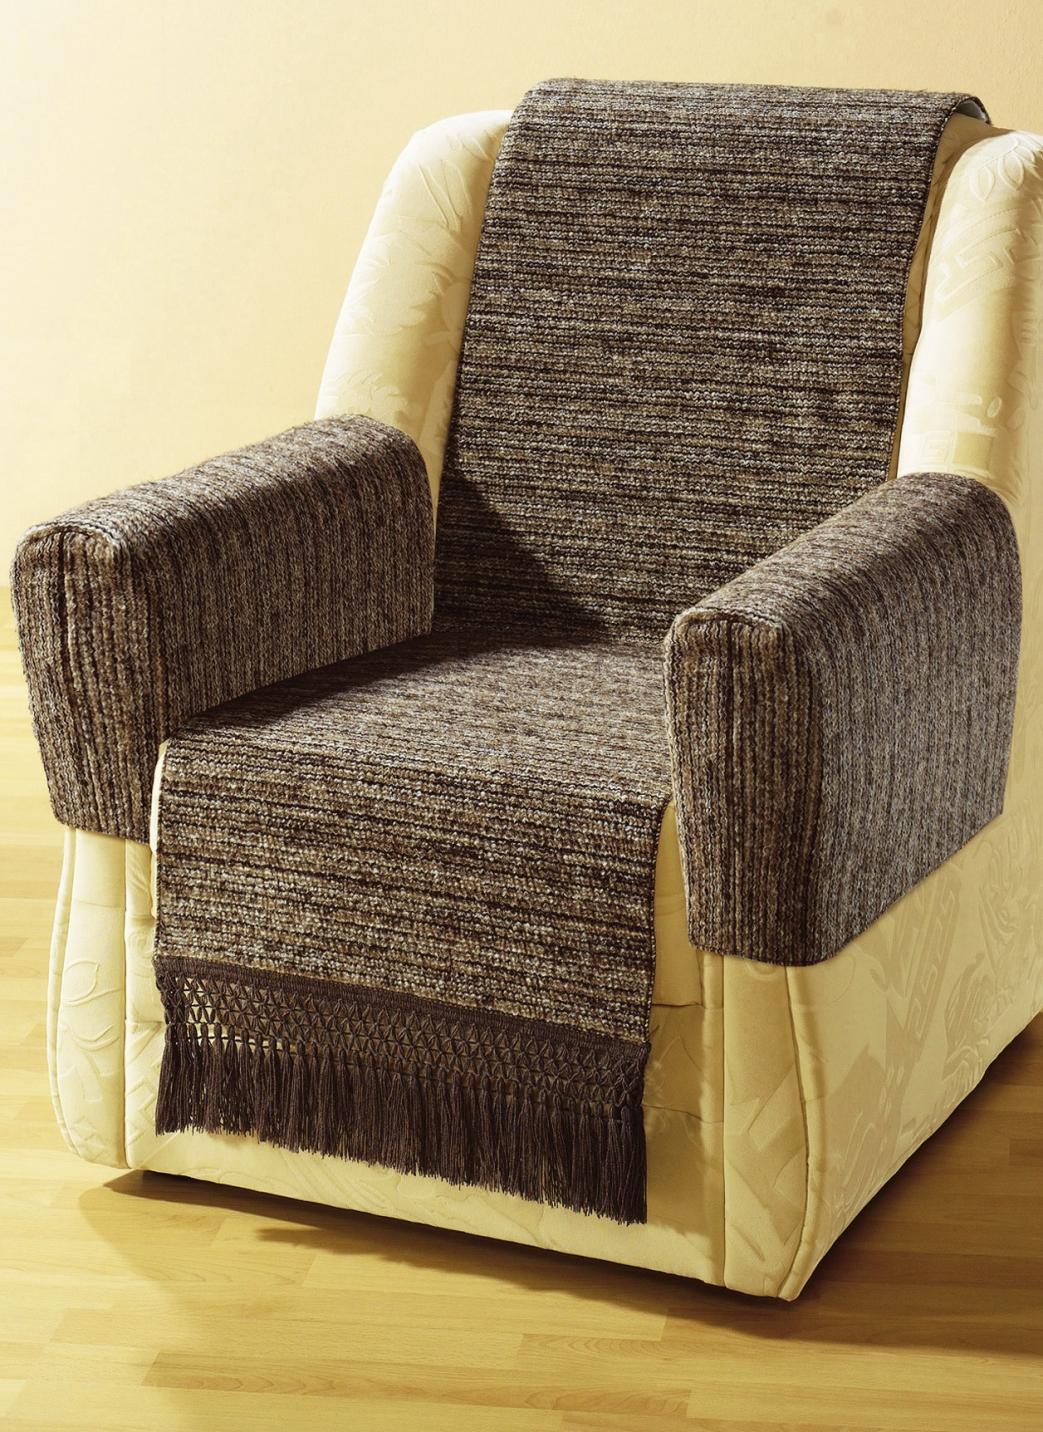 sessel und armlehnenschoner sessel sofa berw rfe bader. Black Bedroom Furniture Sets. Home Design Ideas